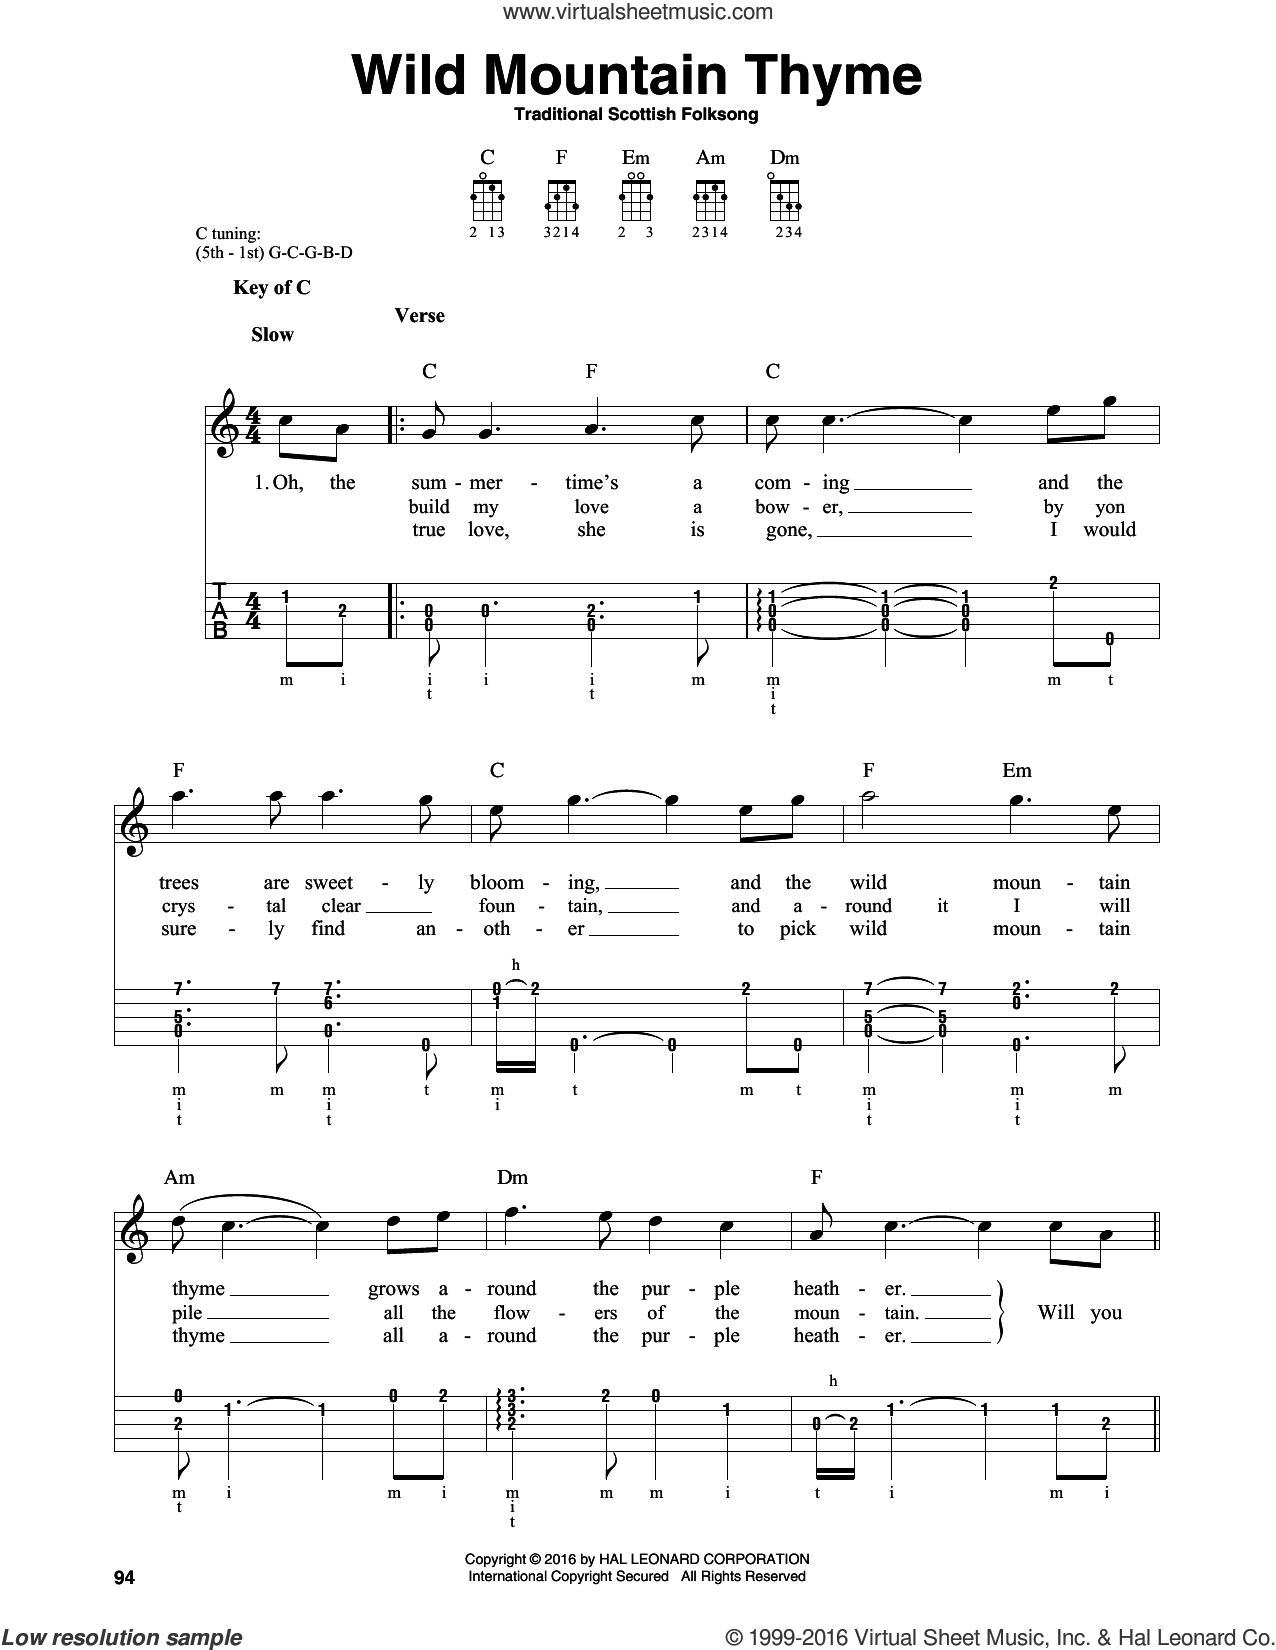 Wild Mountain Thyme sheet music for banjo solo, intermediate skill level